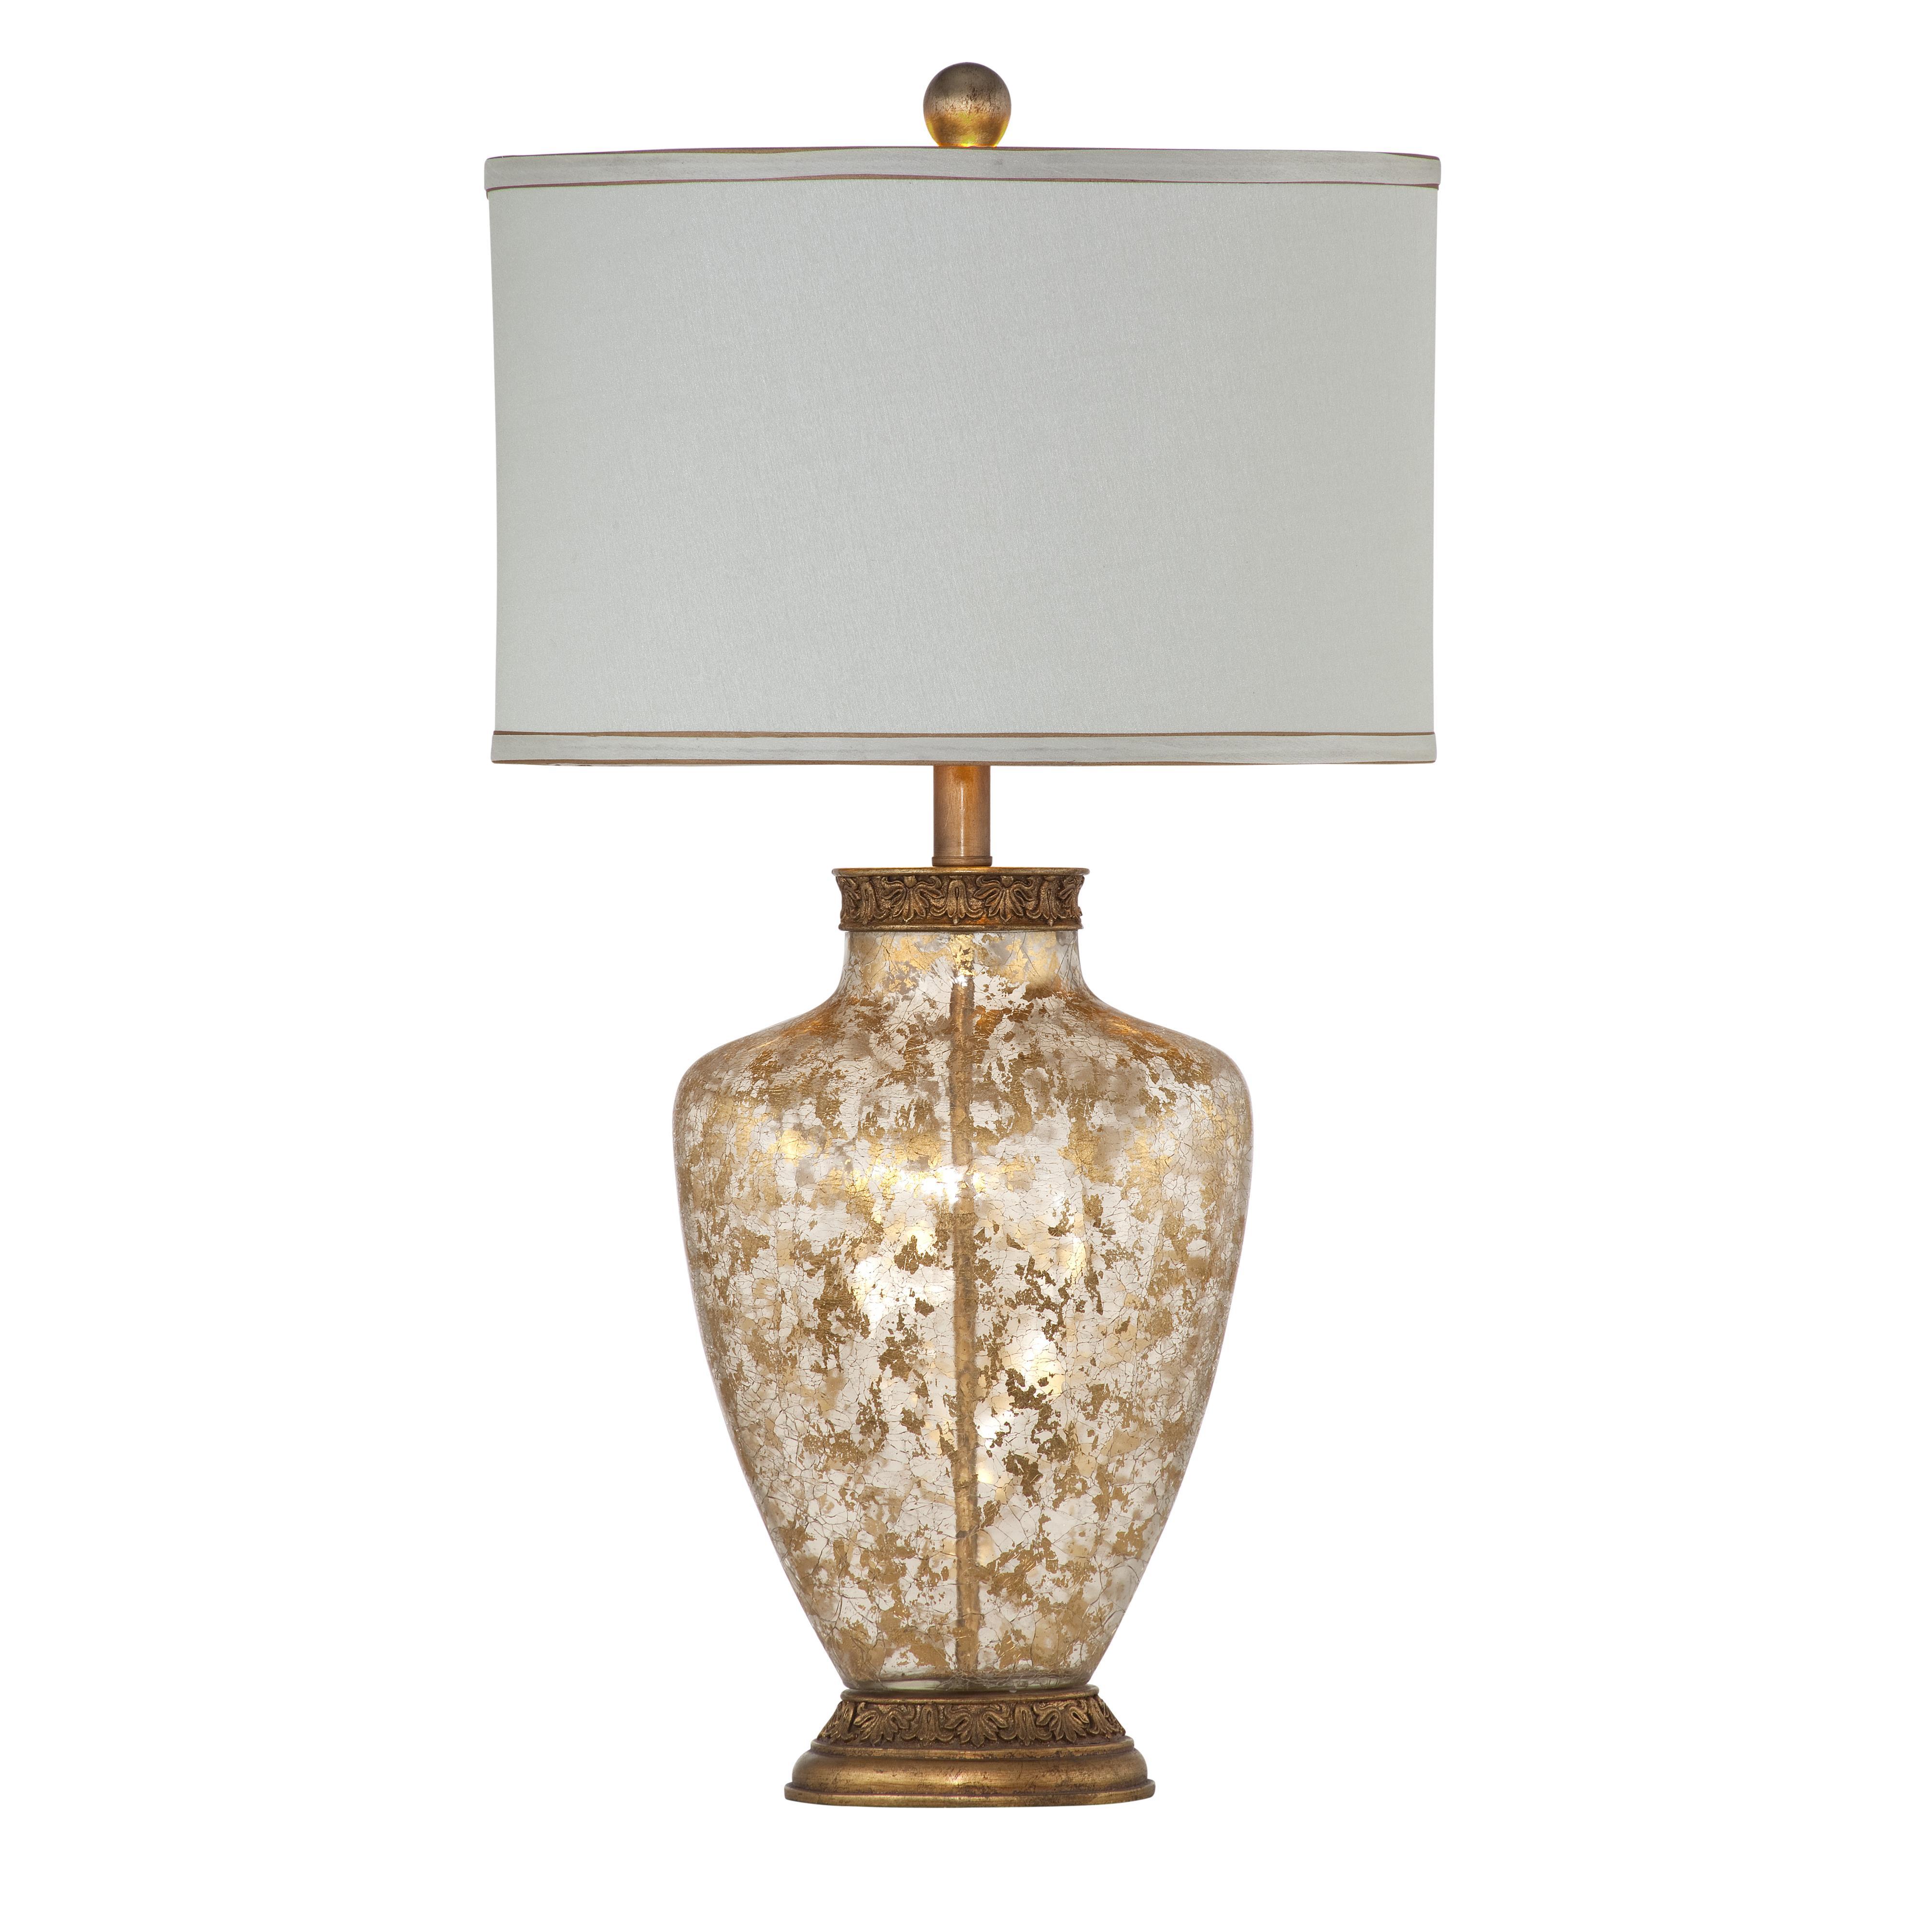 Old World Marlborough Table Lamp by Bassett Mirror at Alison Craig Home Furnishings